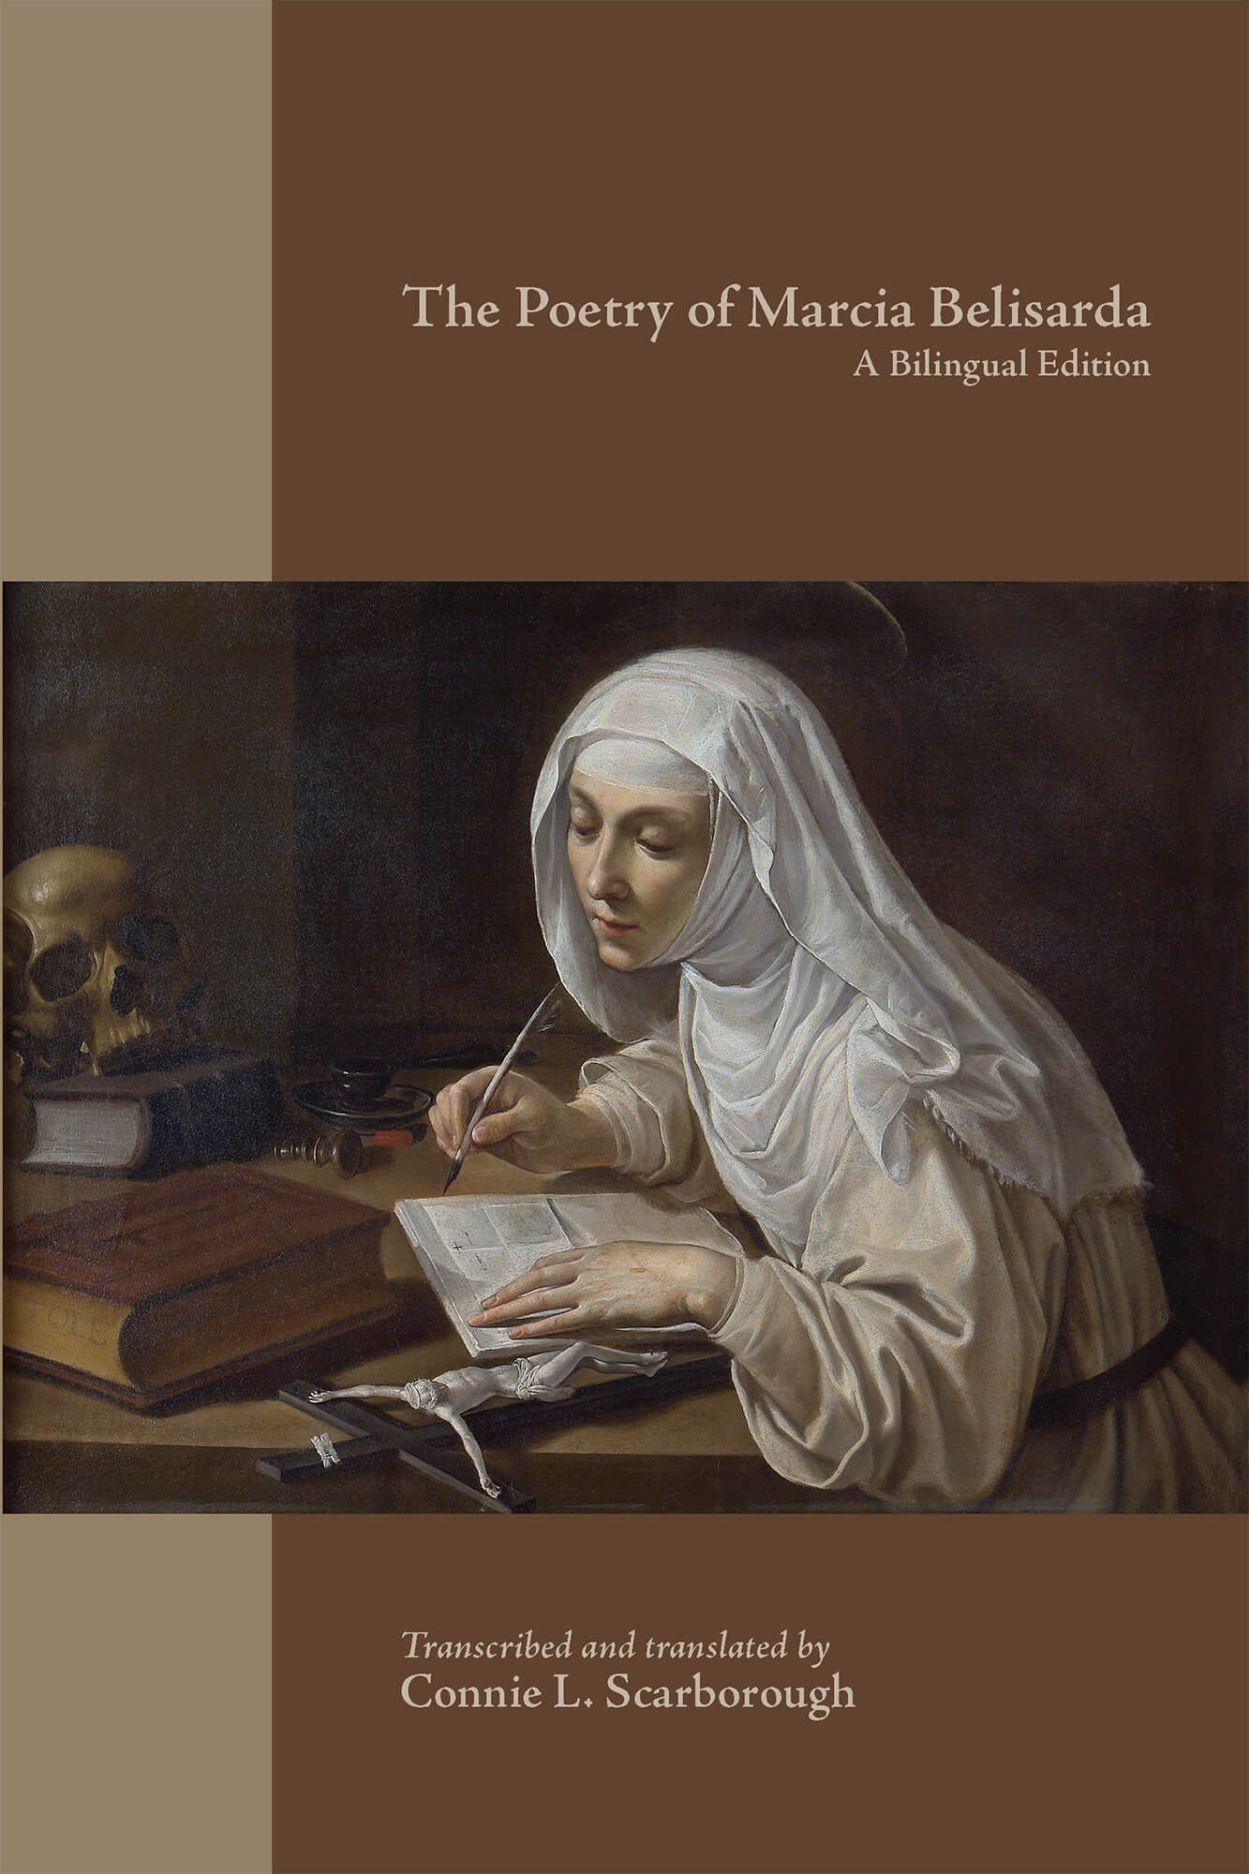 Poetry of Marcia Belisarda: A Bilingual Edition